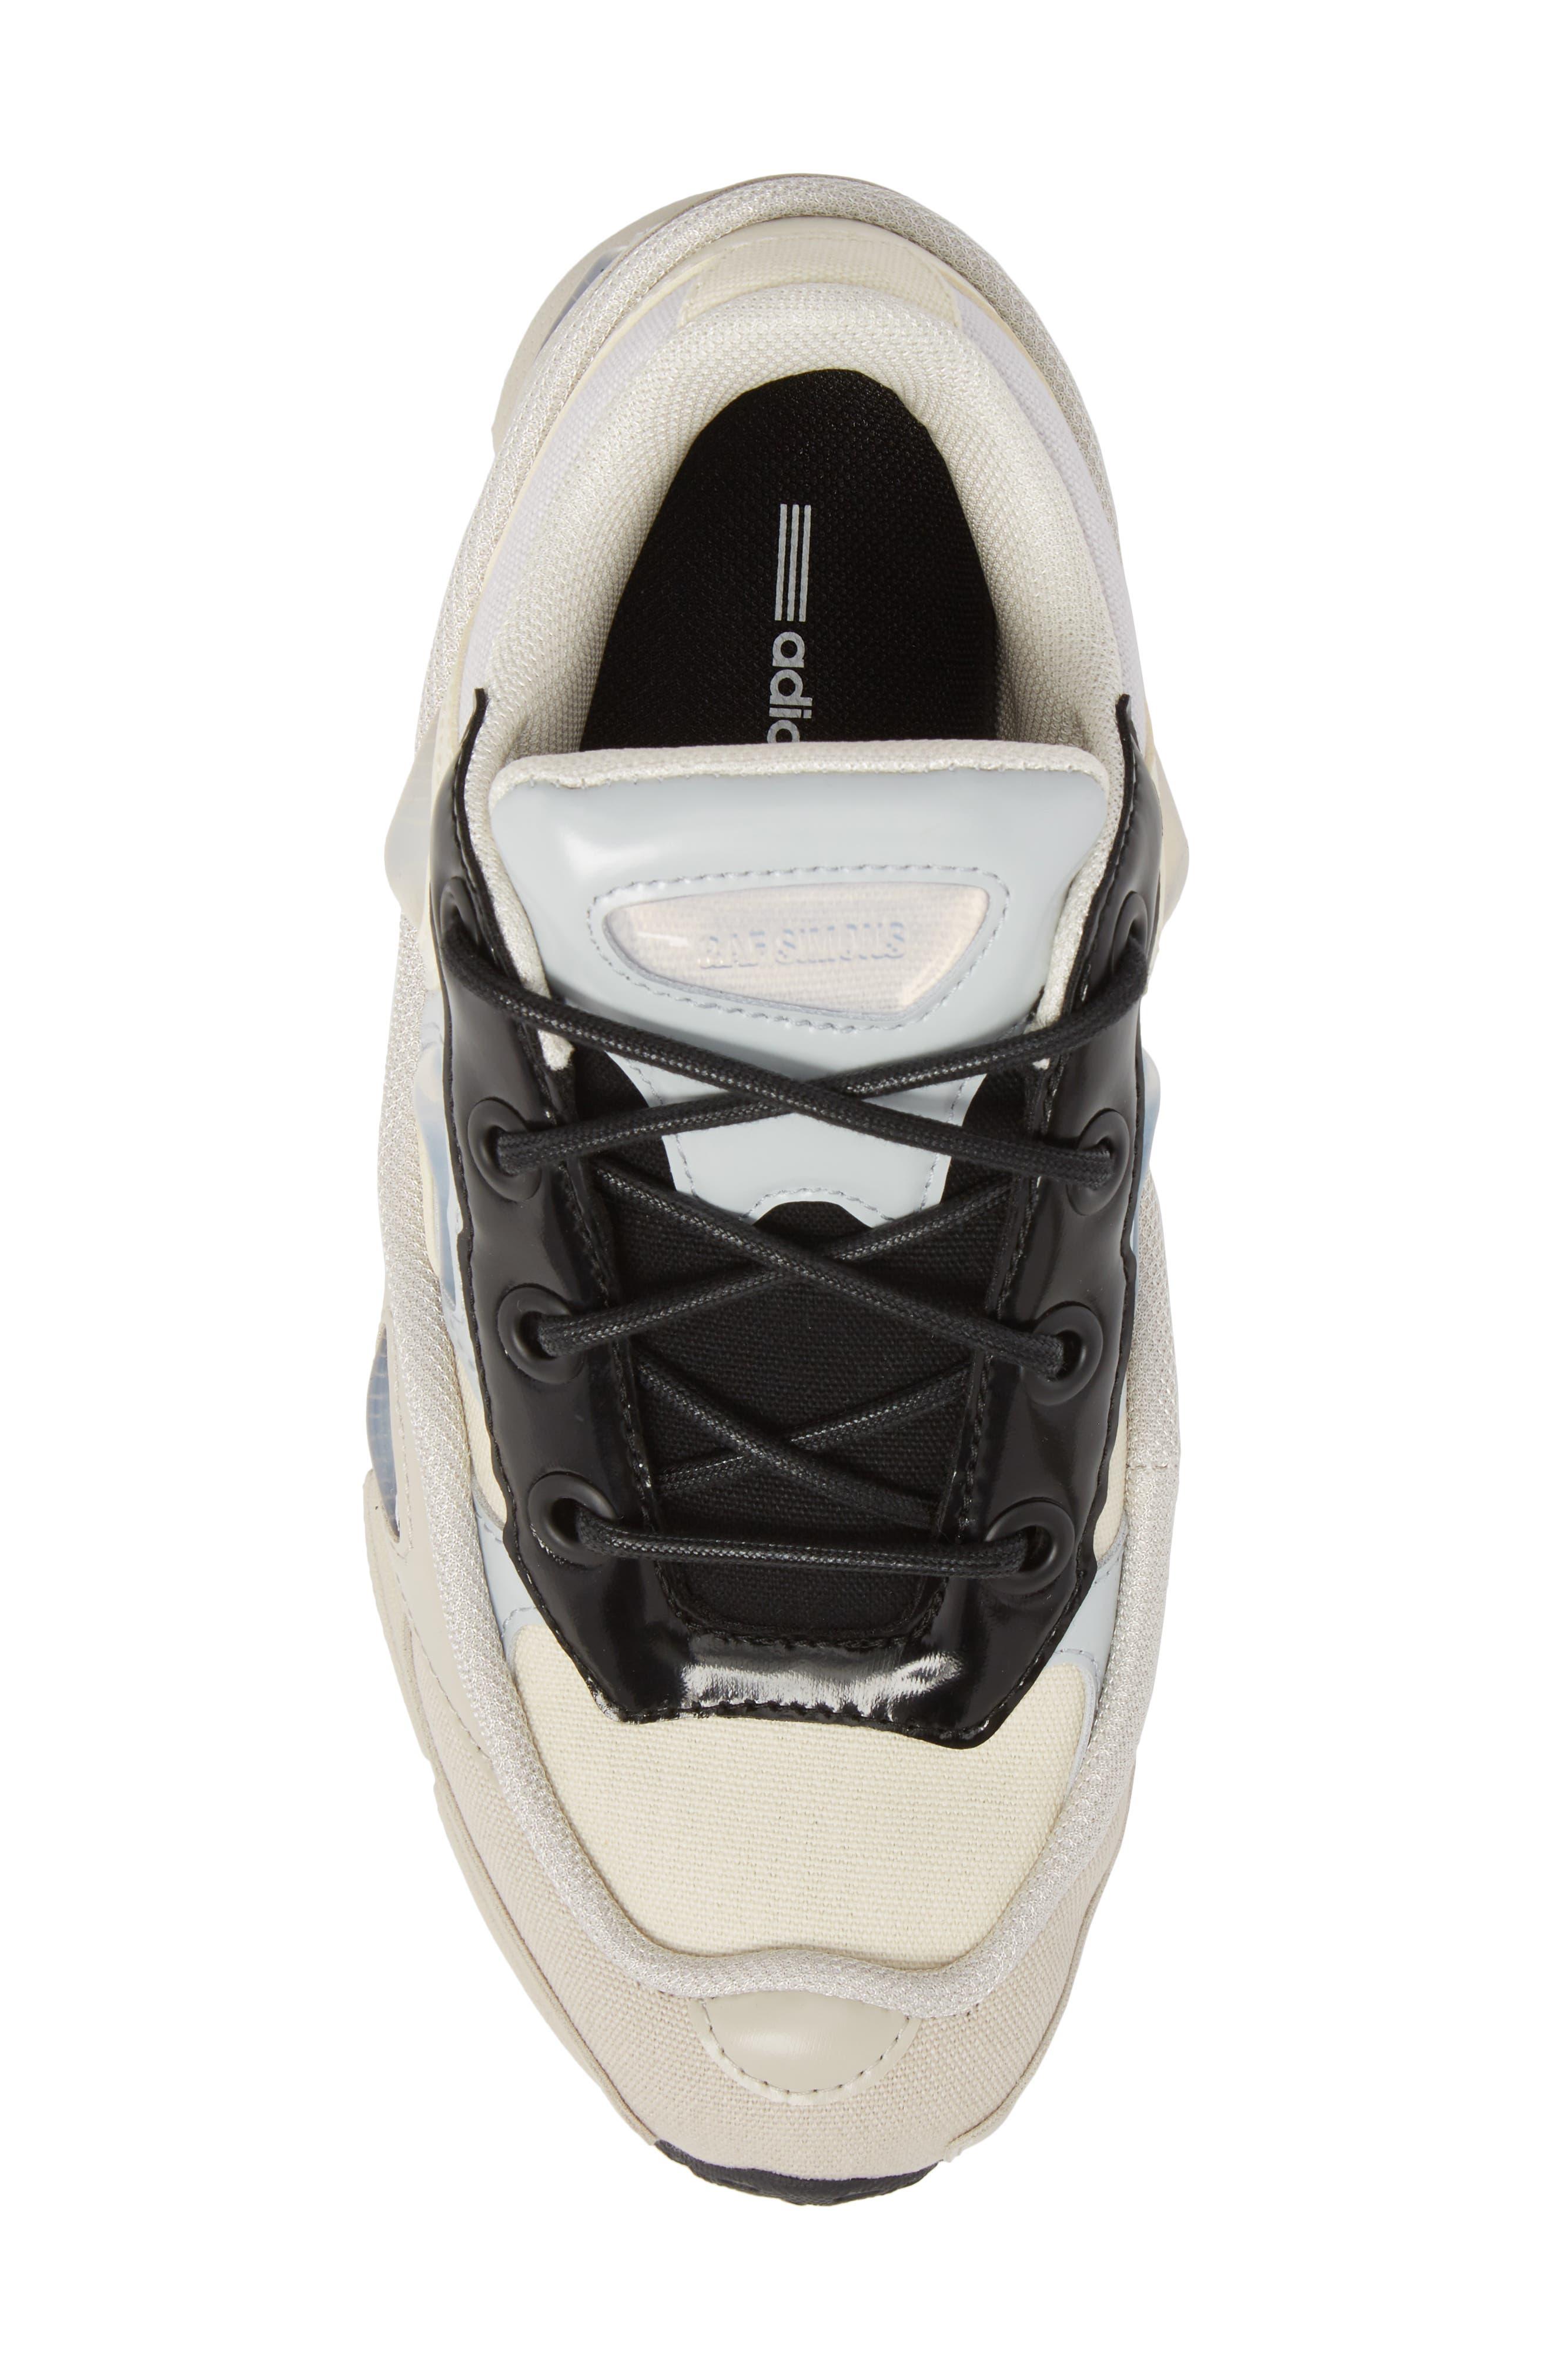 adidas by Raf Simons Ozweego III Sneaker,                             Alternate thumbnail 5, color,                             Cream White/ Mist Stone/ Black